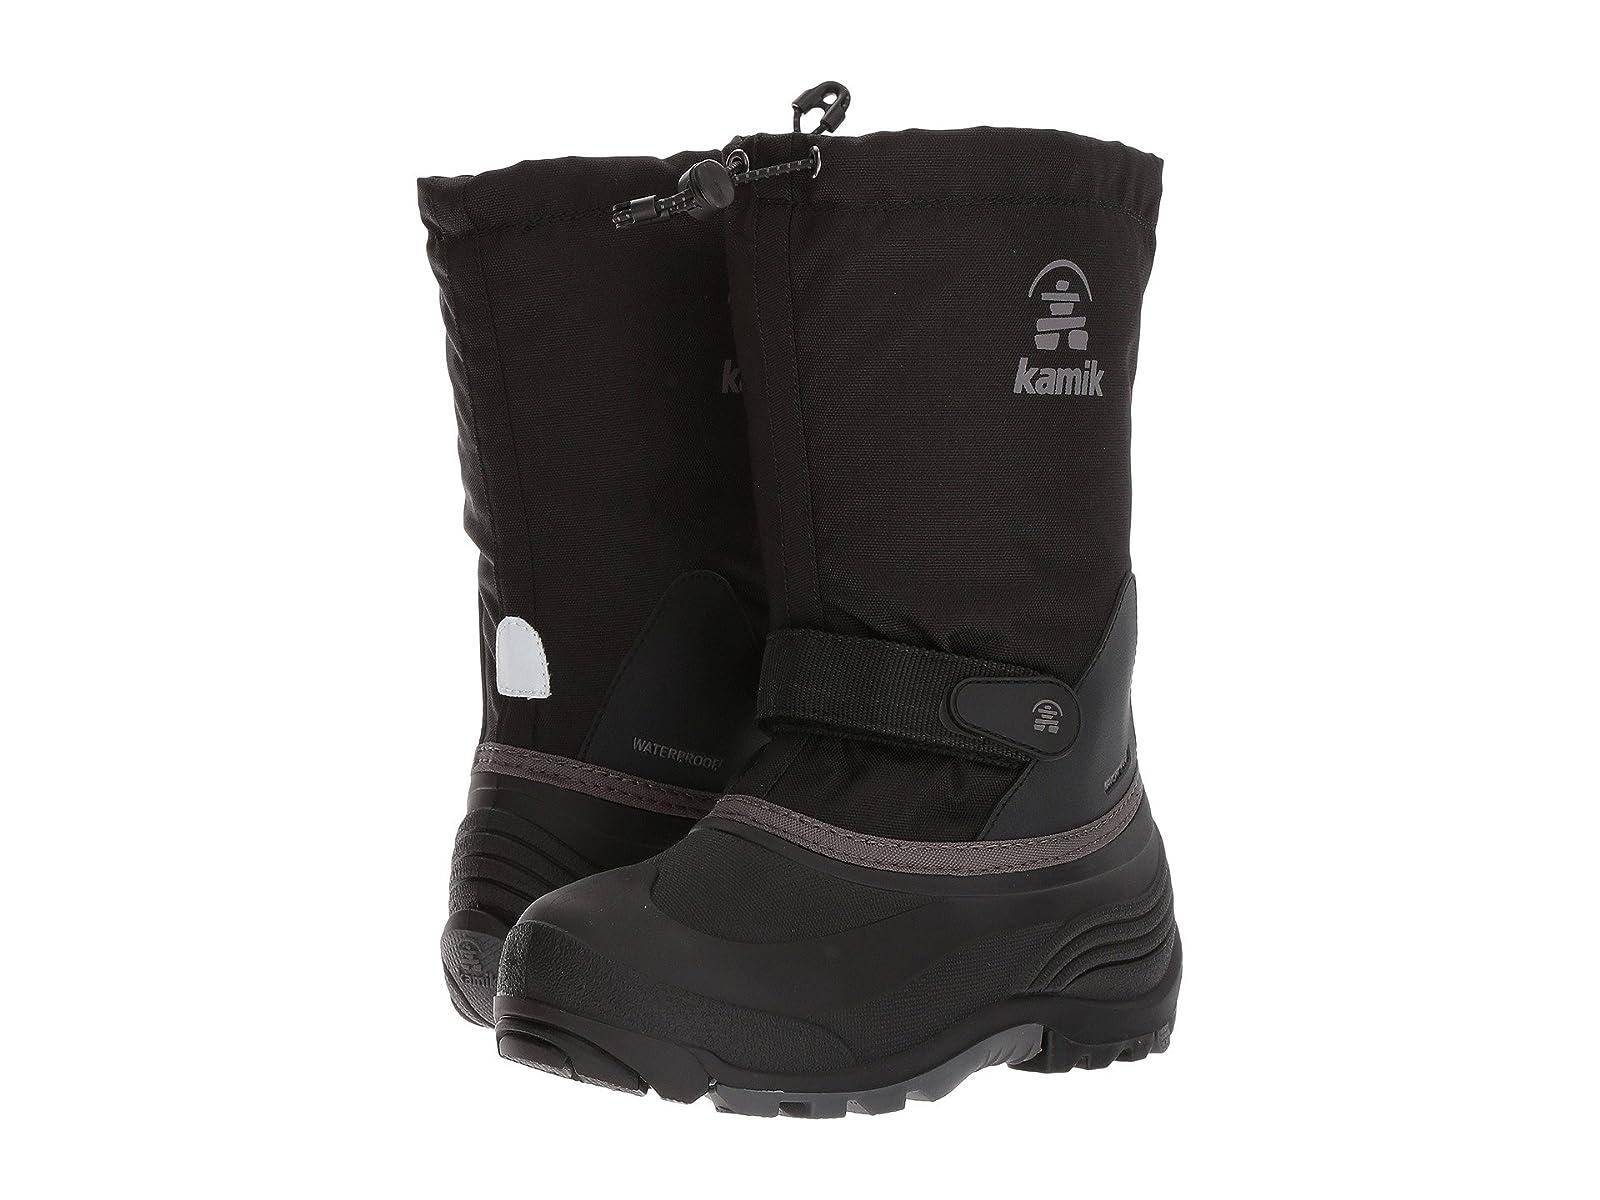 Kamik Kids WaterbugW (Toddler/Little Kid/Big Kid)Affordable and distinctive shoes